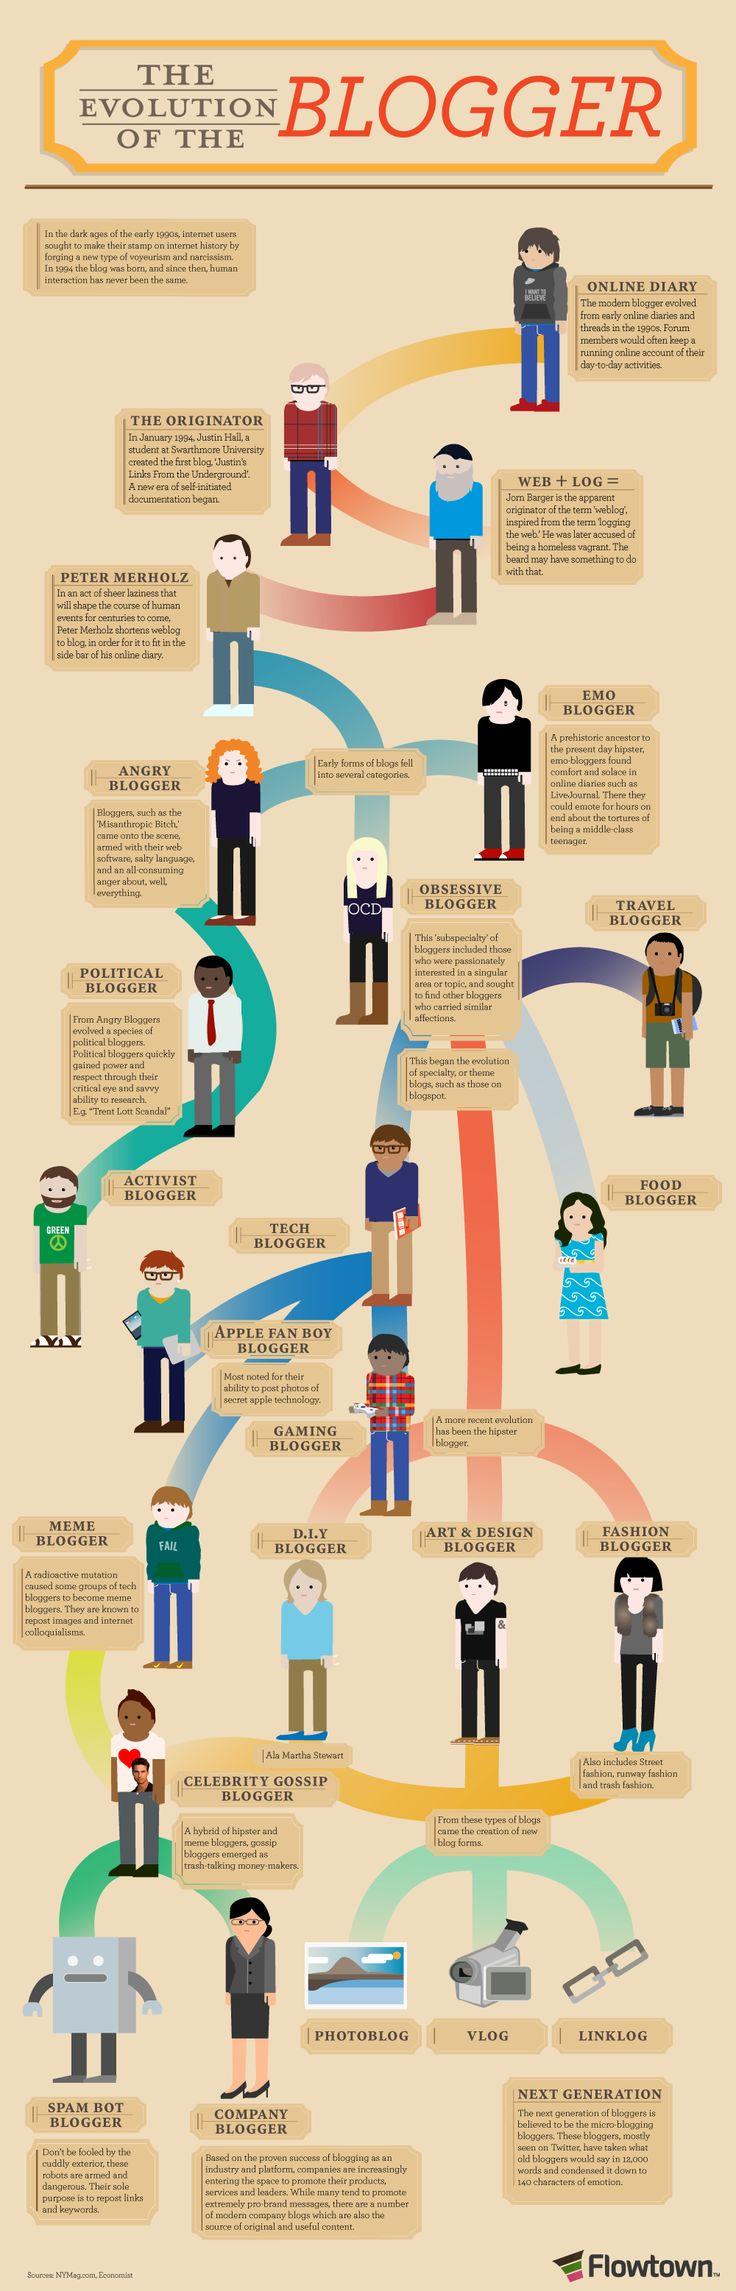 Social Media #Infographic: